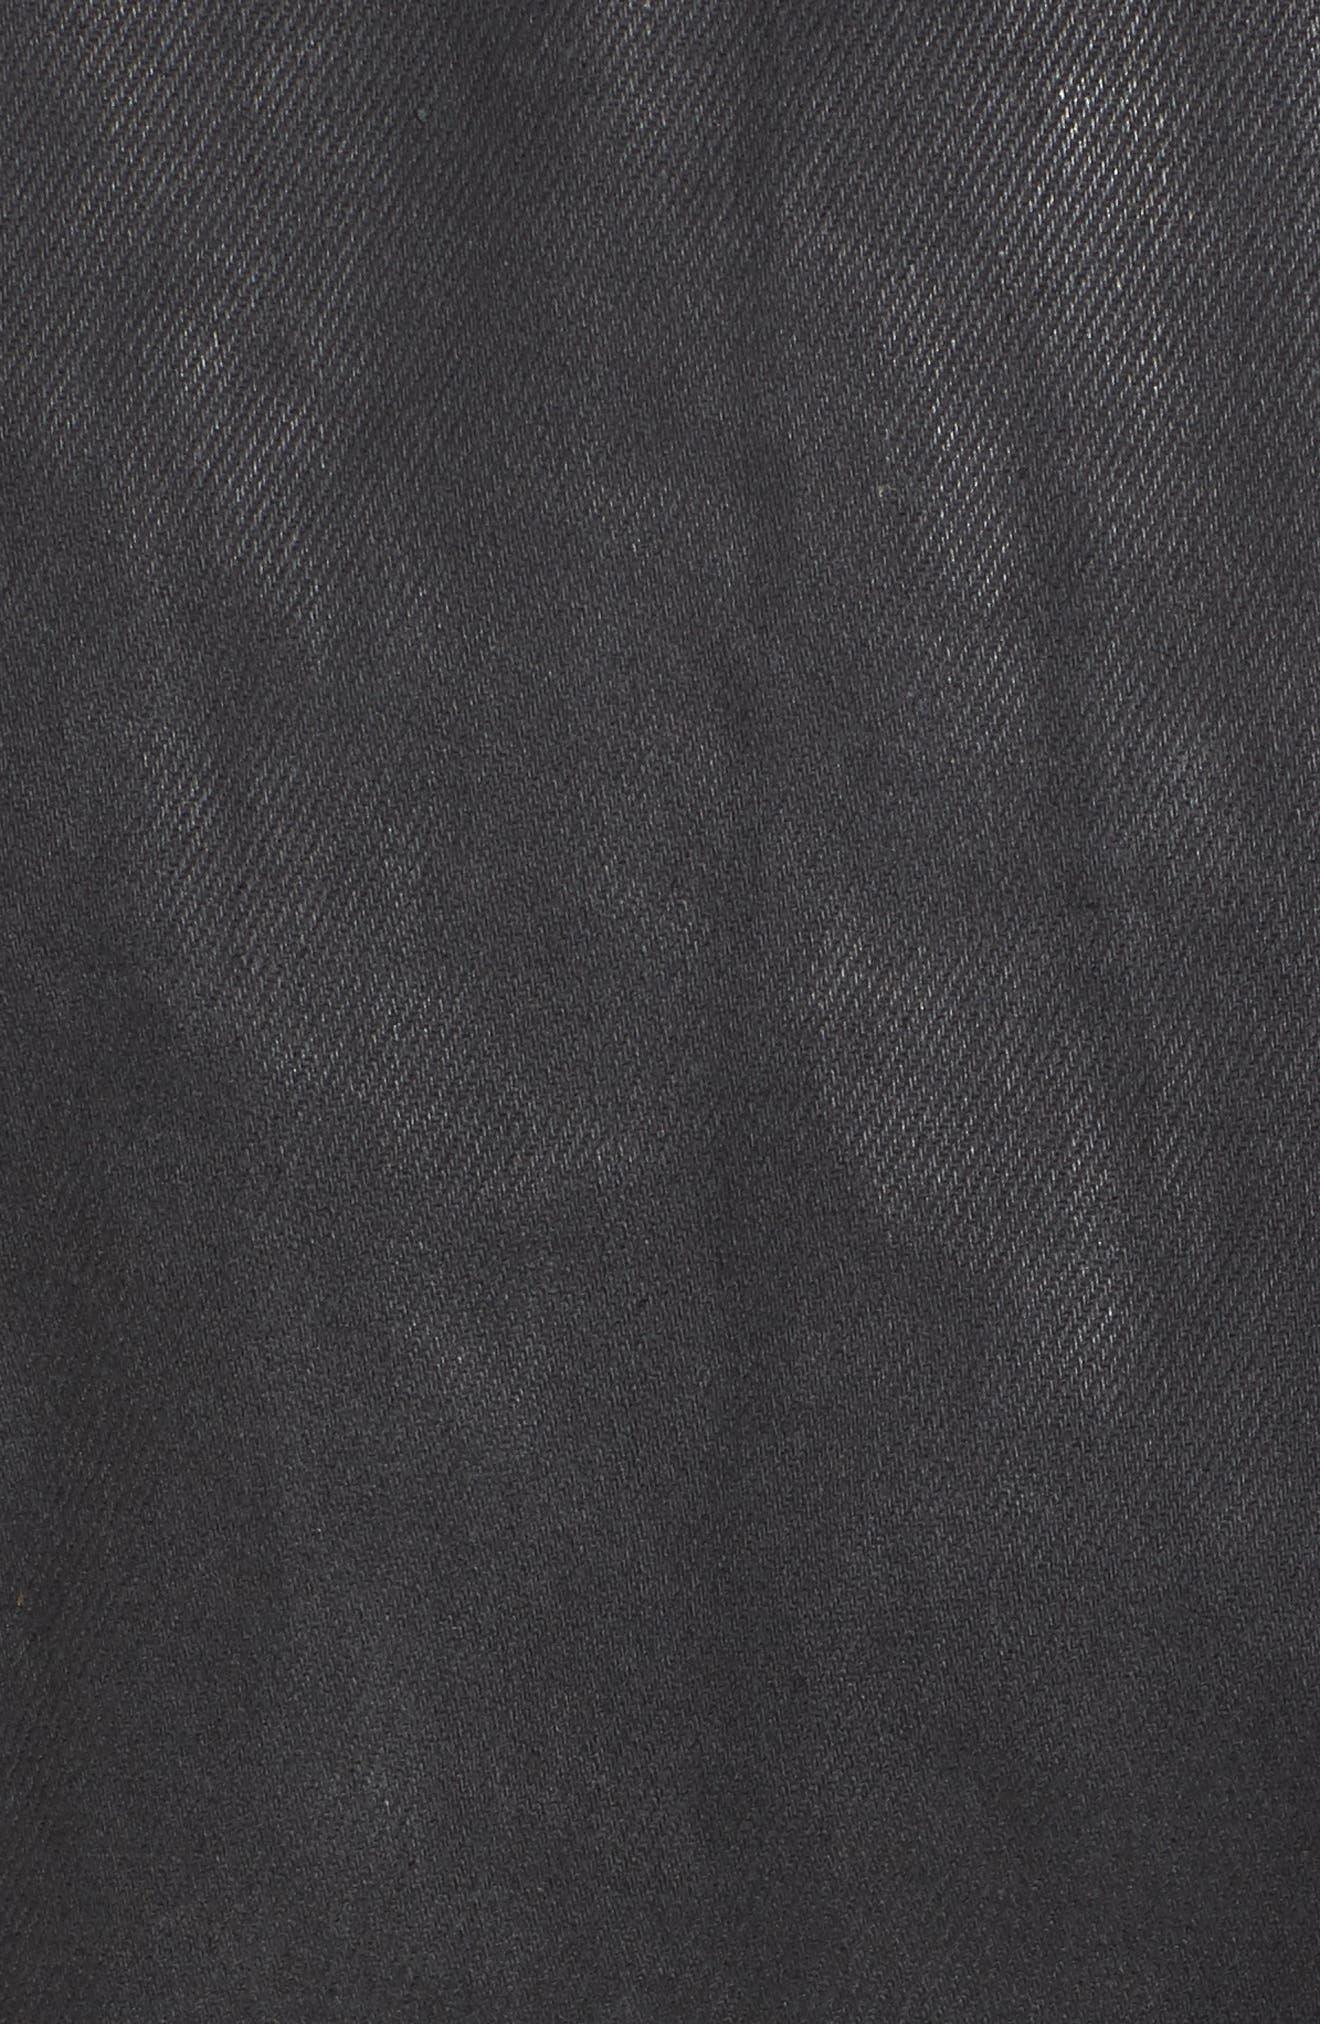 Motac 3D Slim Denim Jacket,                             Alternate thumbnail 6, color,                             001